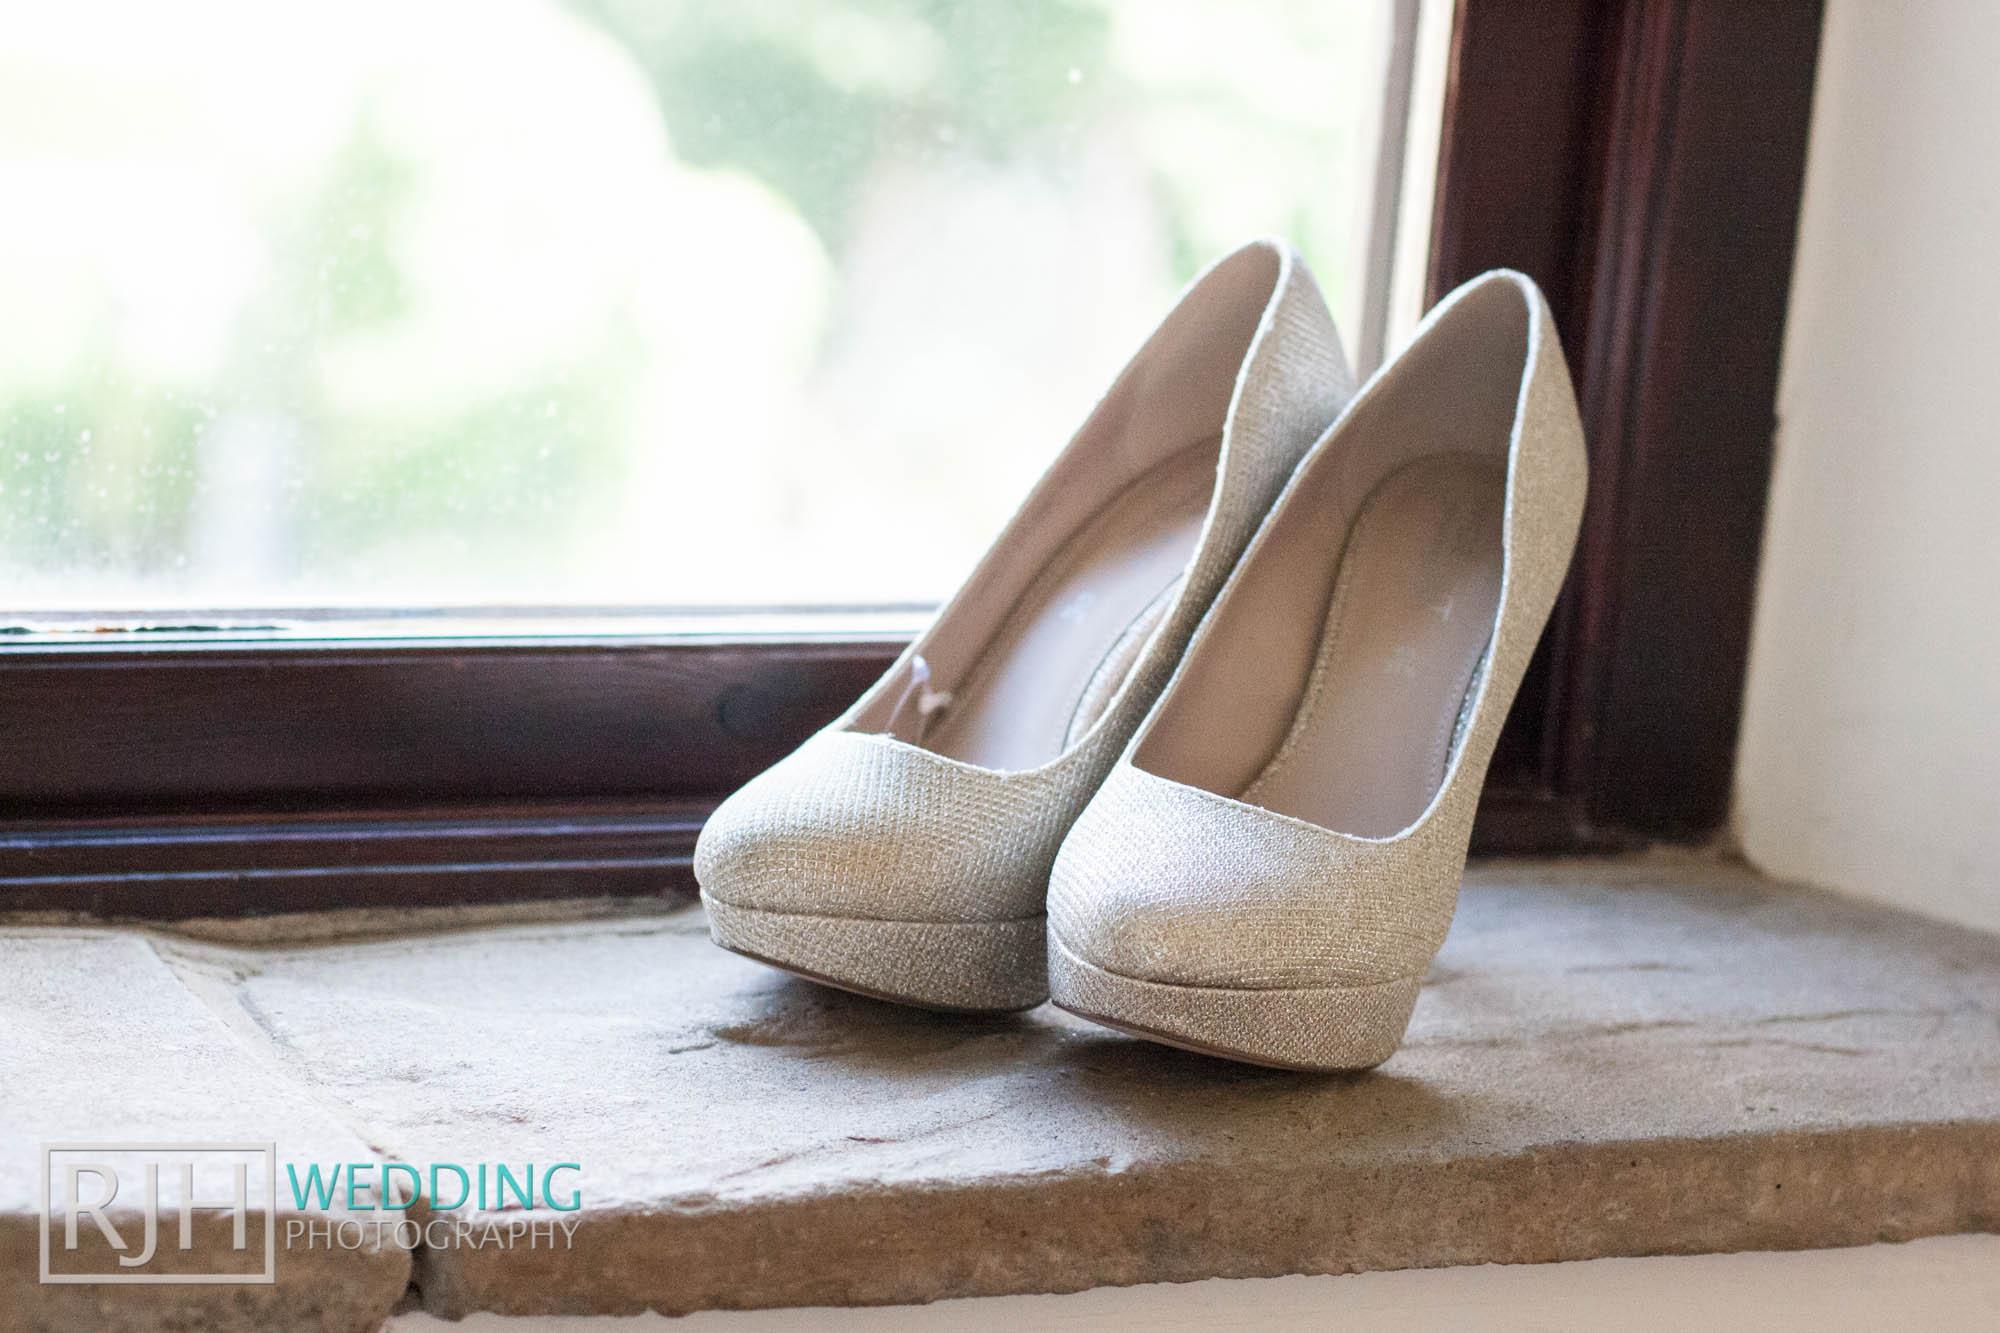 RJH Wedding Photography_Tankersley Manor Wedding_04.jpg